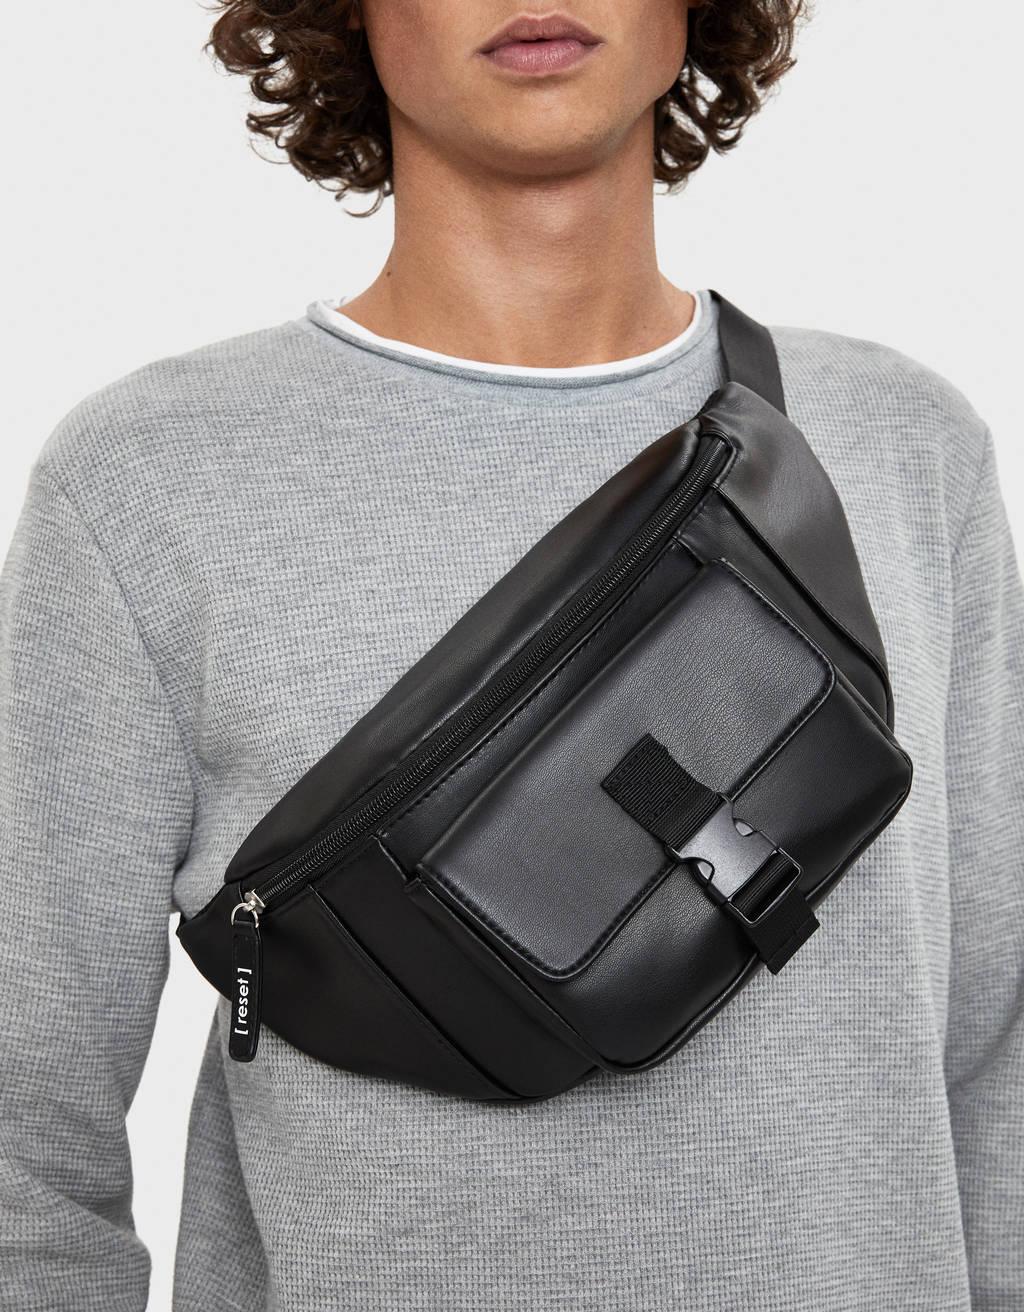 mens bag trends